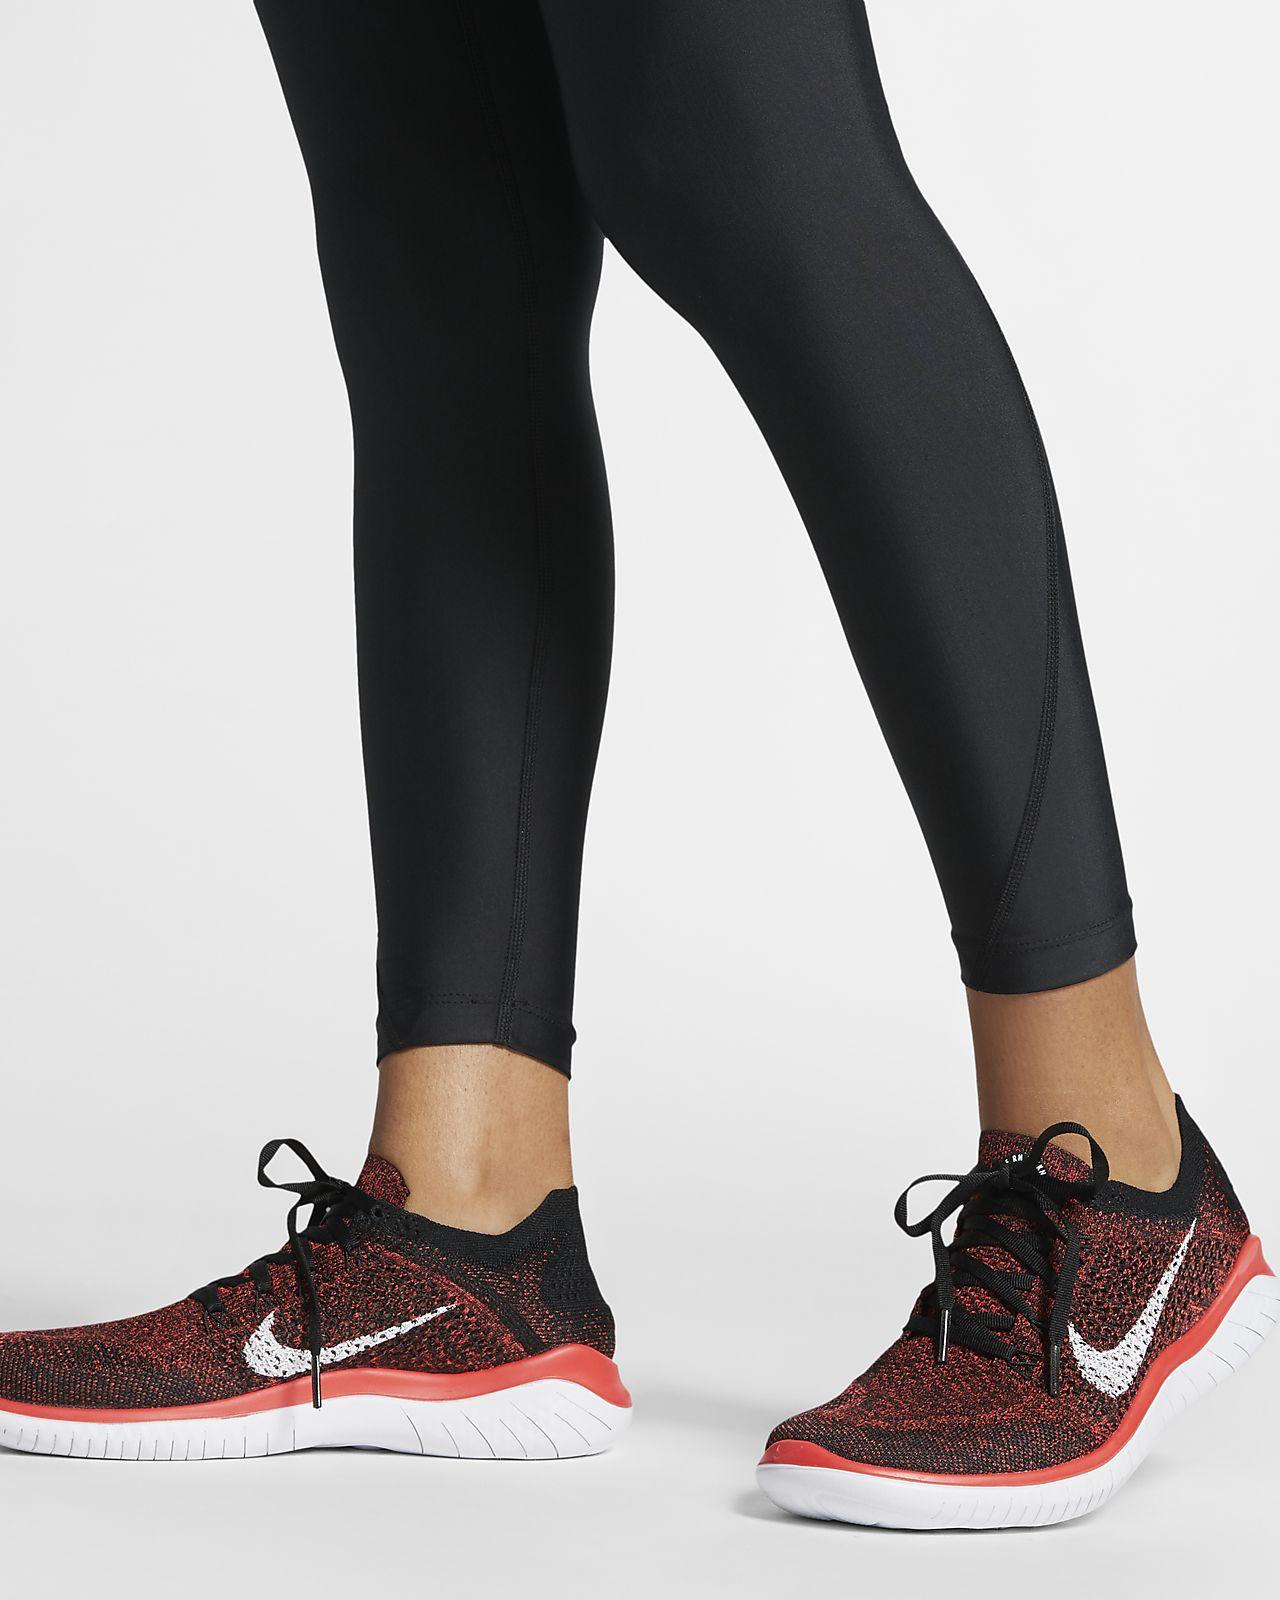 c6569ebd25 Nike Speed Women's 7/8 Tights. Nike.com CA